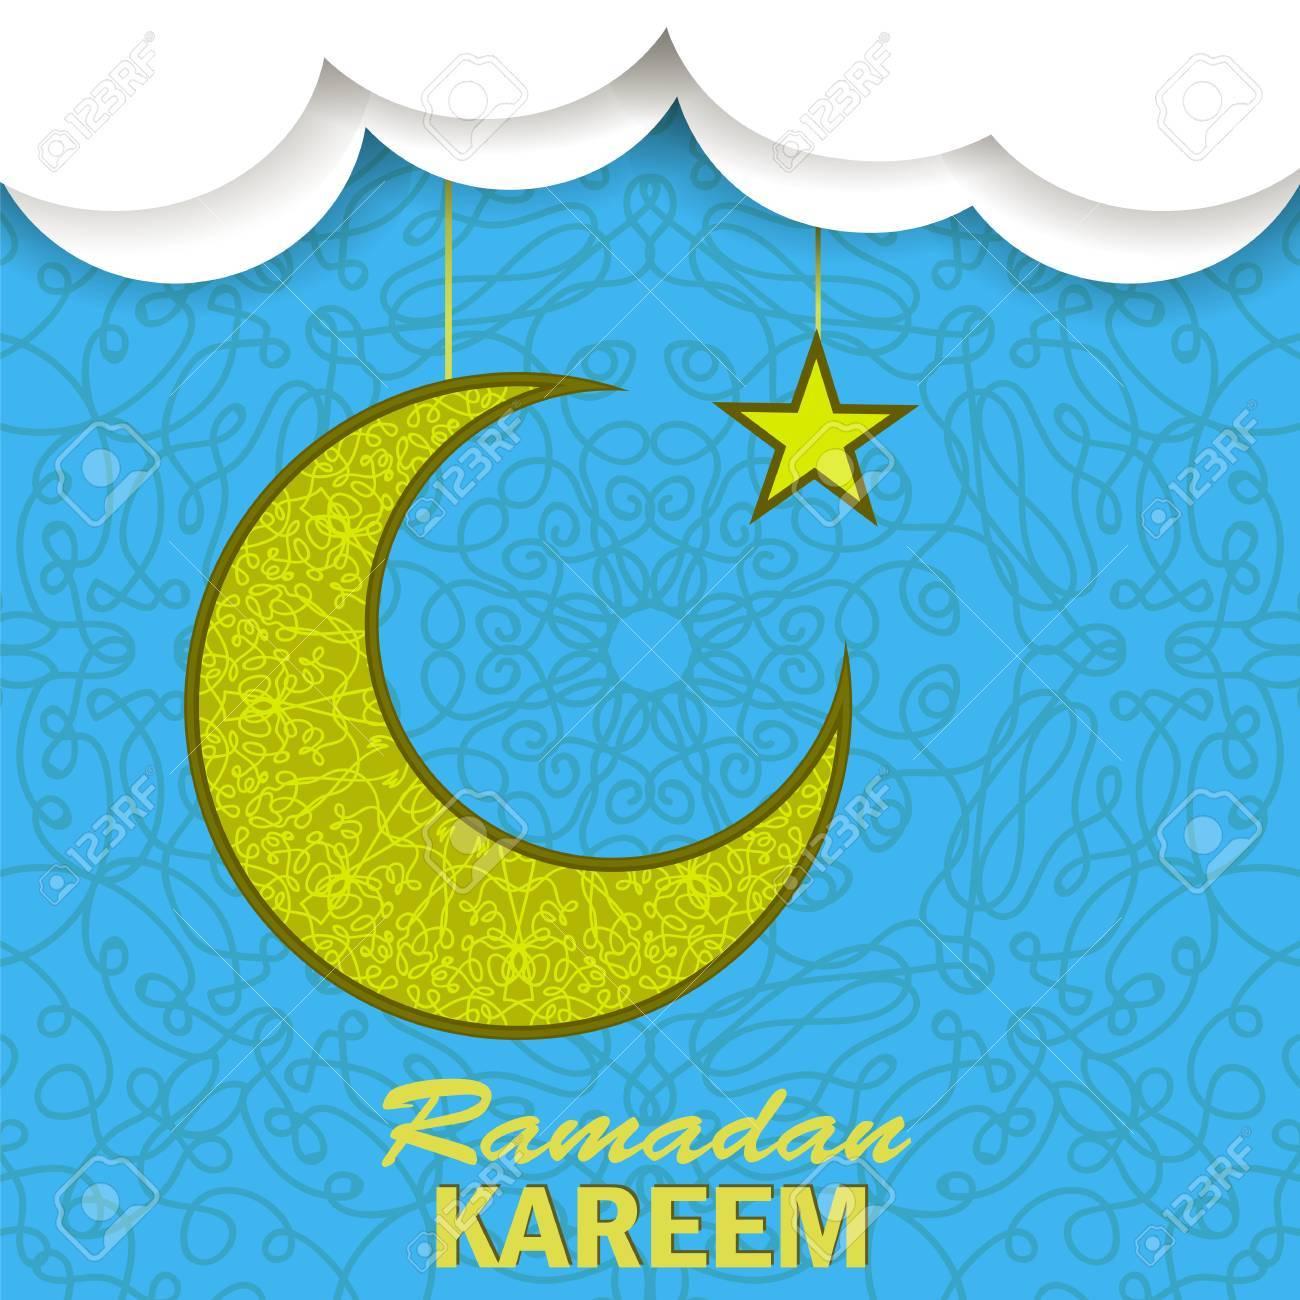 Ramadan greetings background ramadan kareem means ramadan the ramadan greetings background ramadan kareem means ramadan the generous month ramadan greeting card kristyandbryce Images